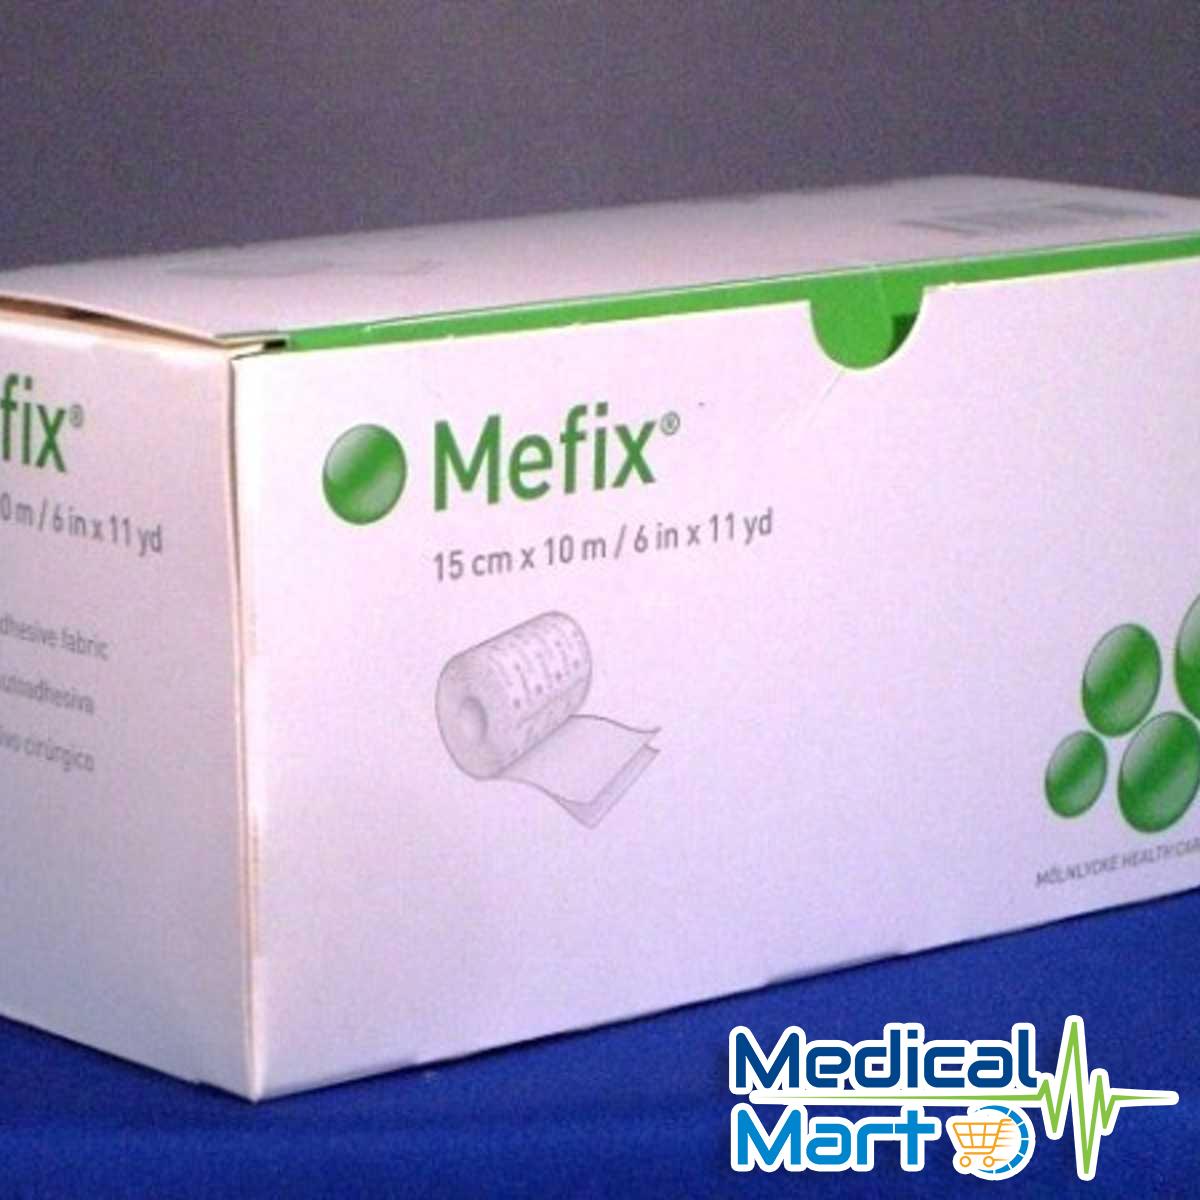 Mefix 15cm x 10m